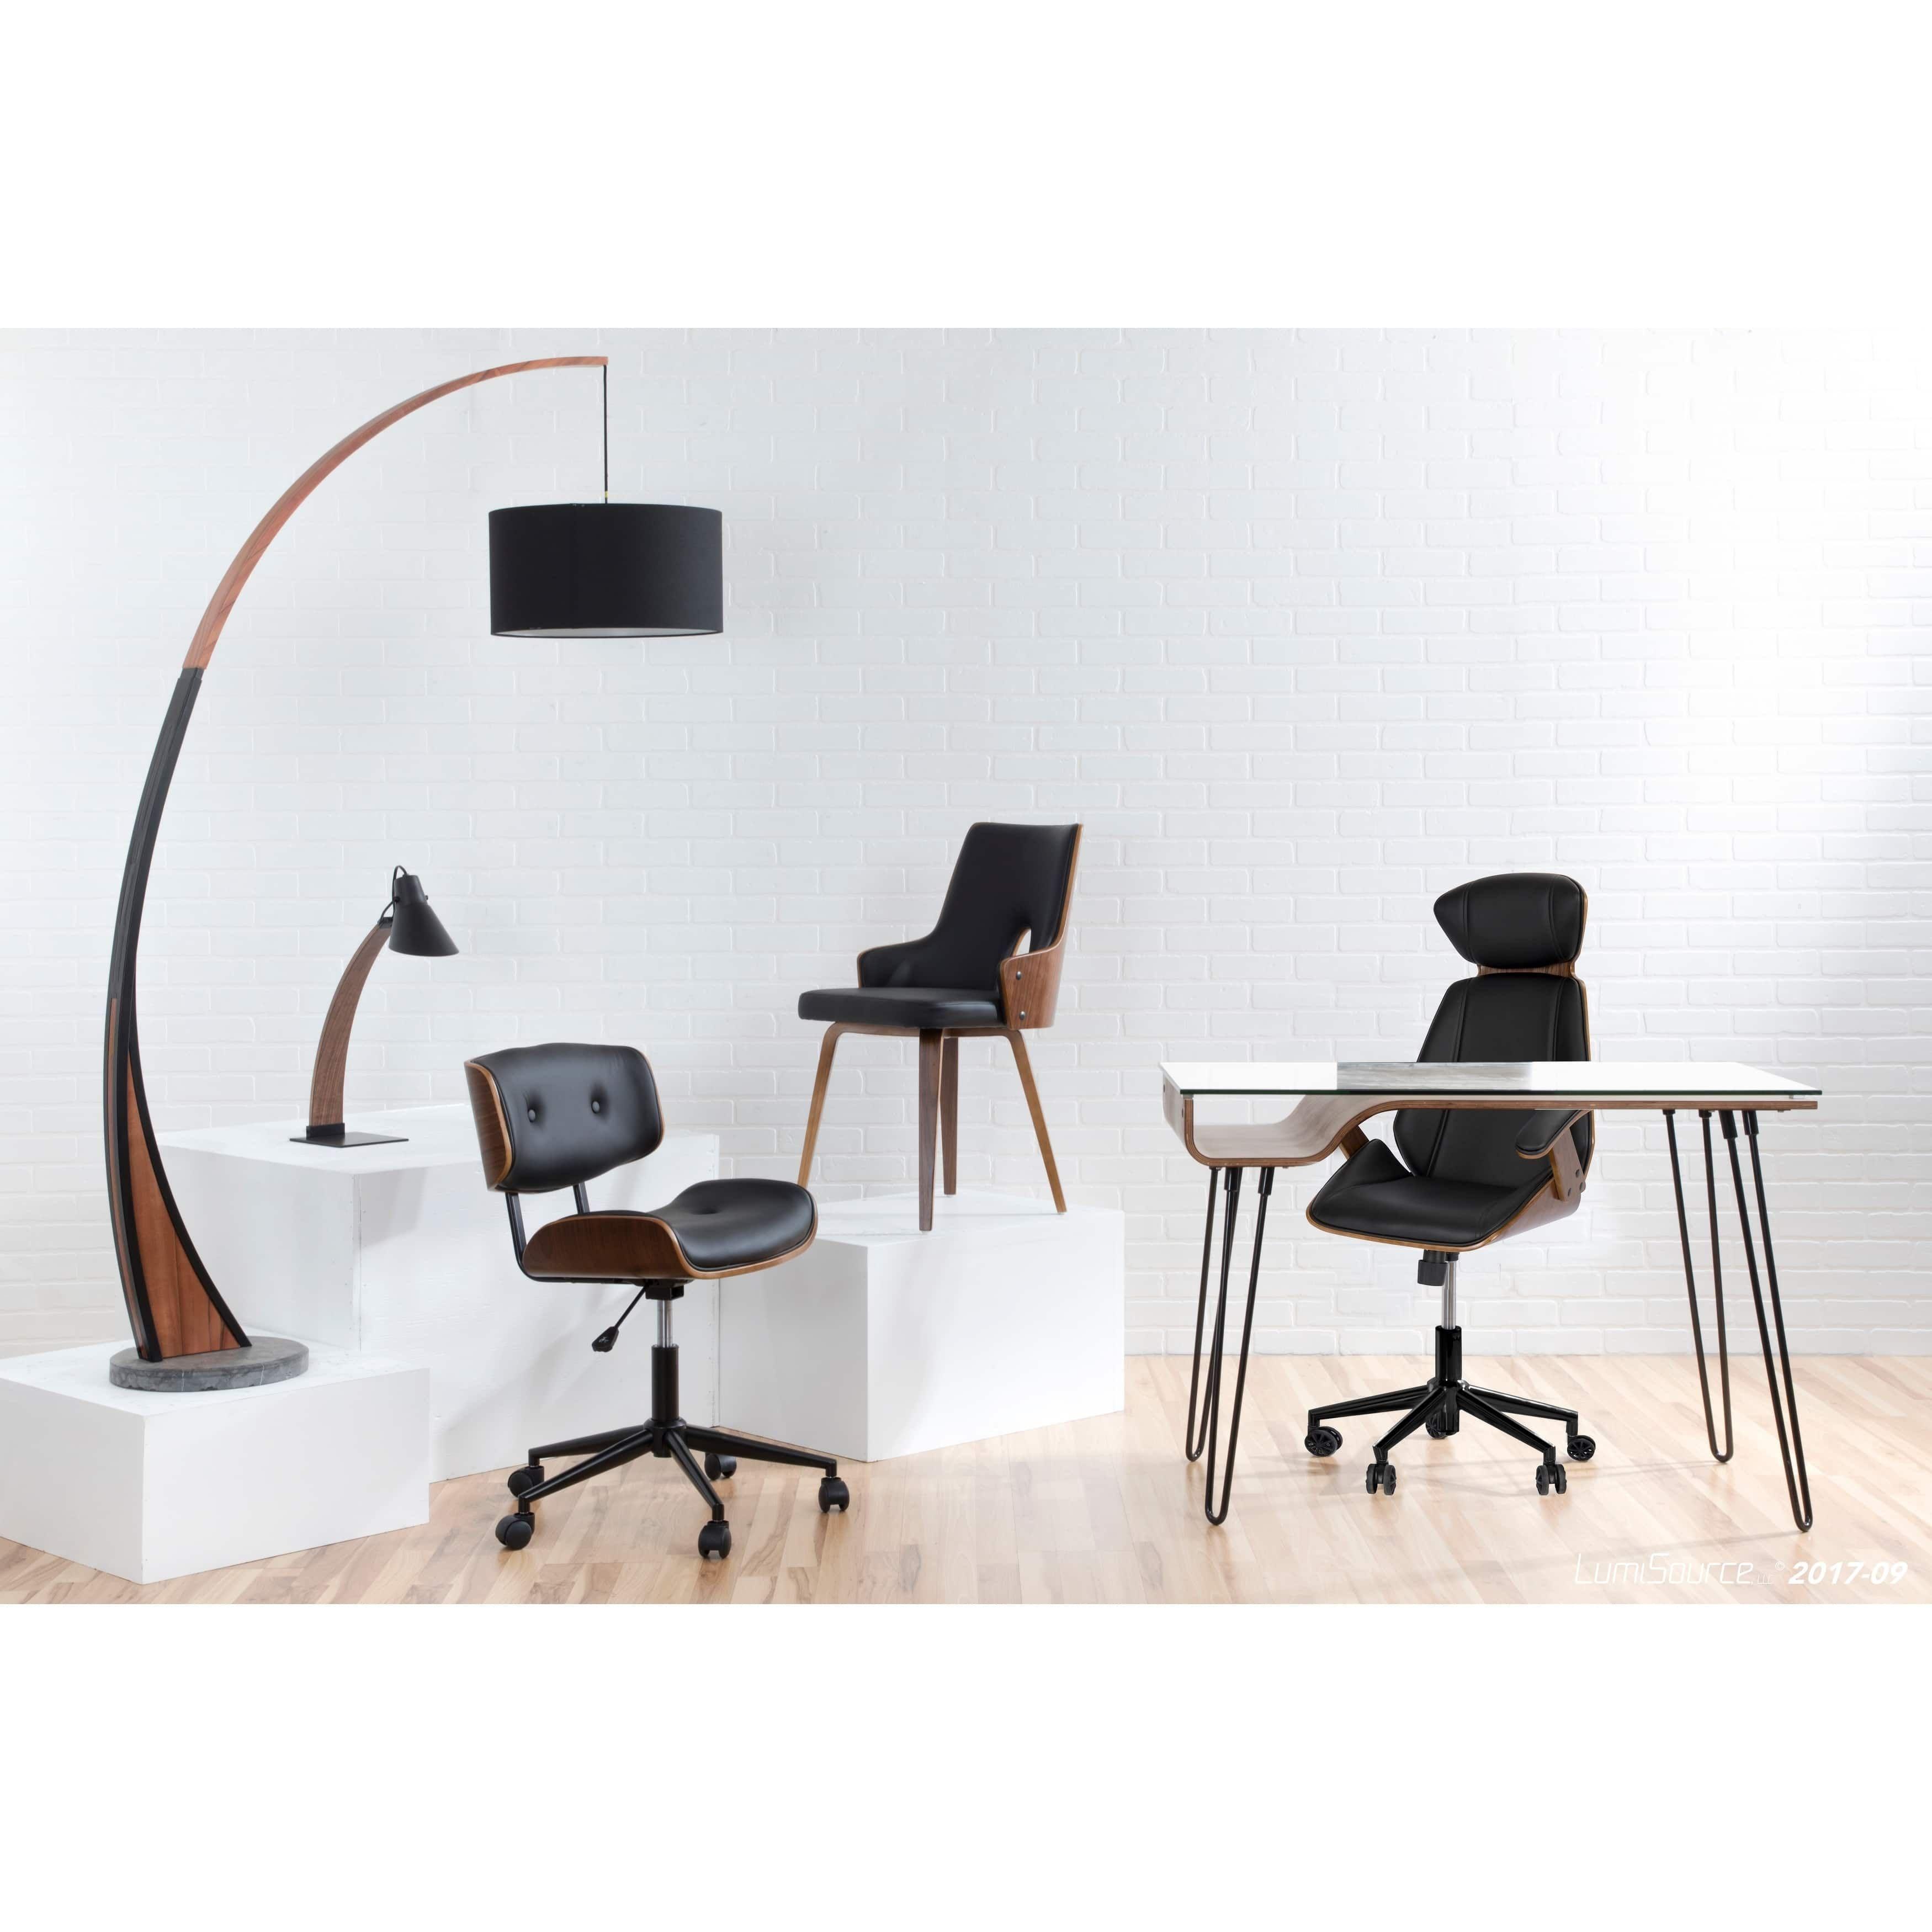 lumisource lombardi mid century modern office chair walnut black rh in pinterest com Art Deco Office Chair Mid Century Modern Desk Chair